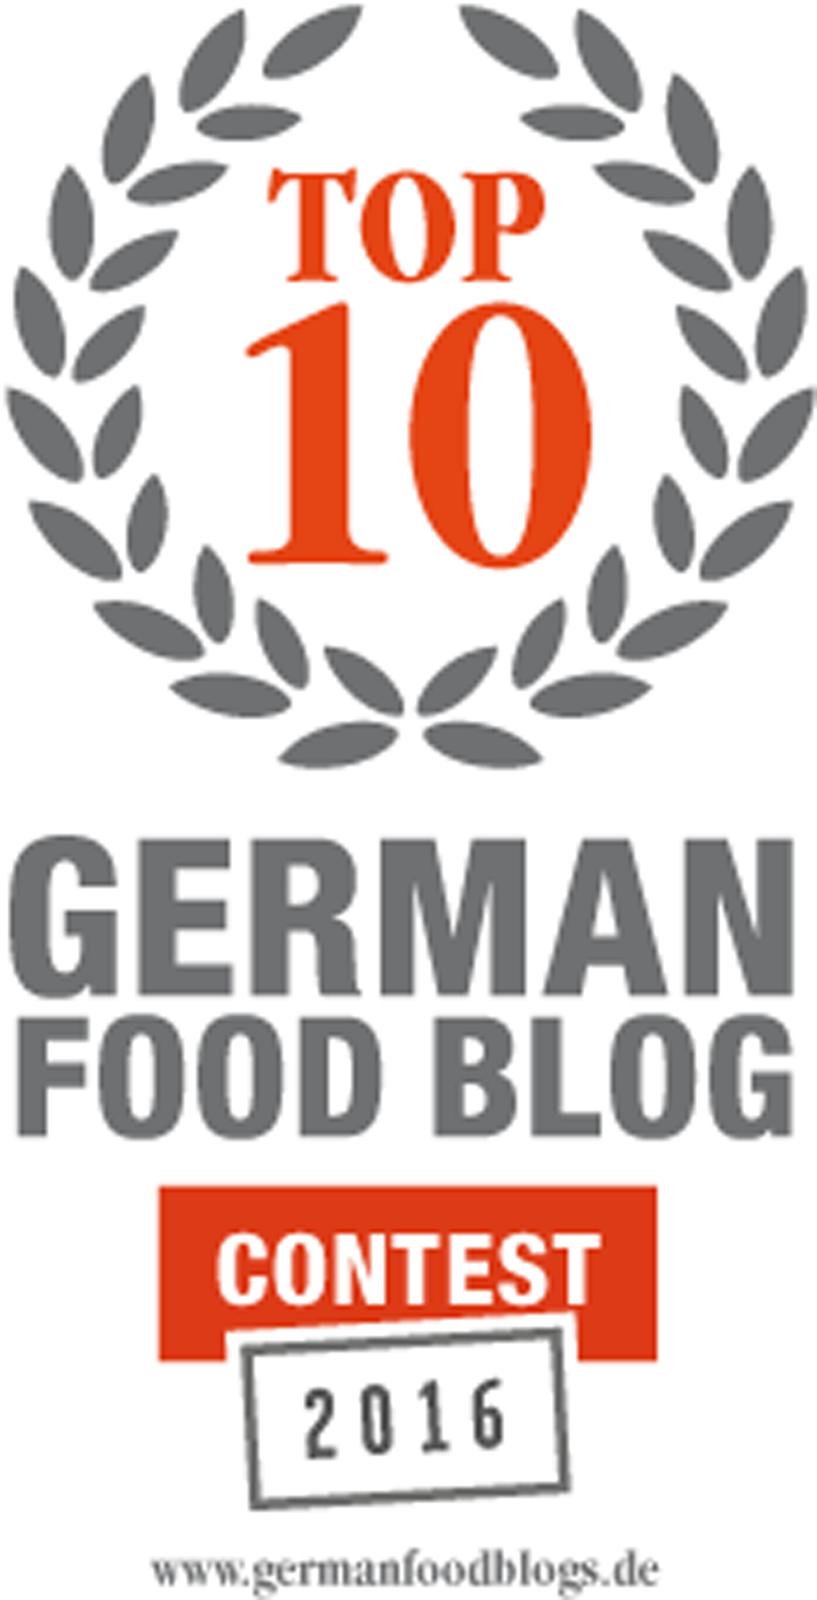 FoodBlogContest 16